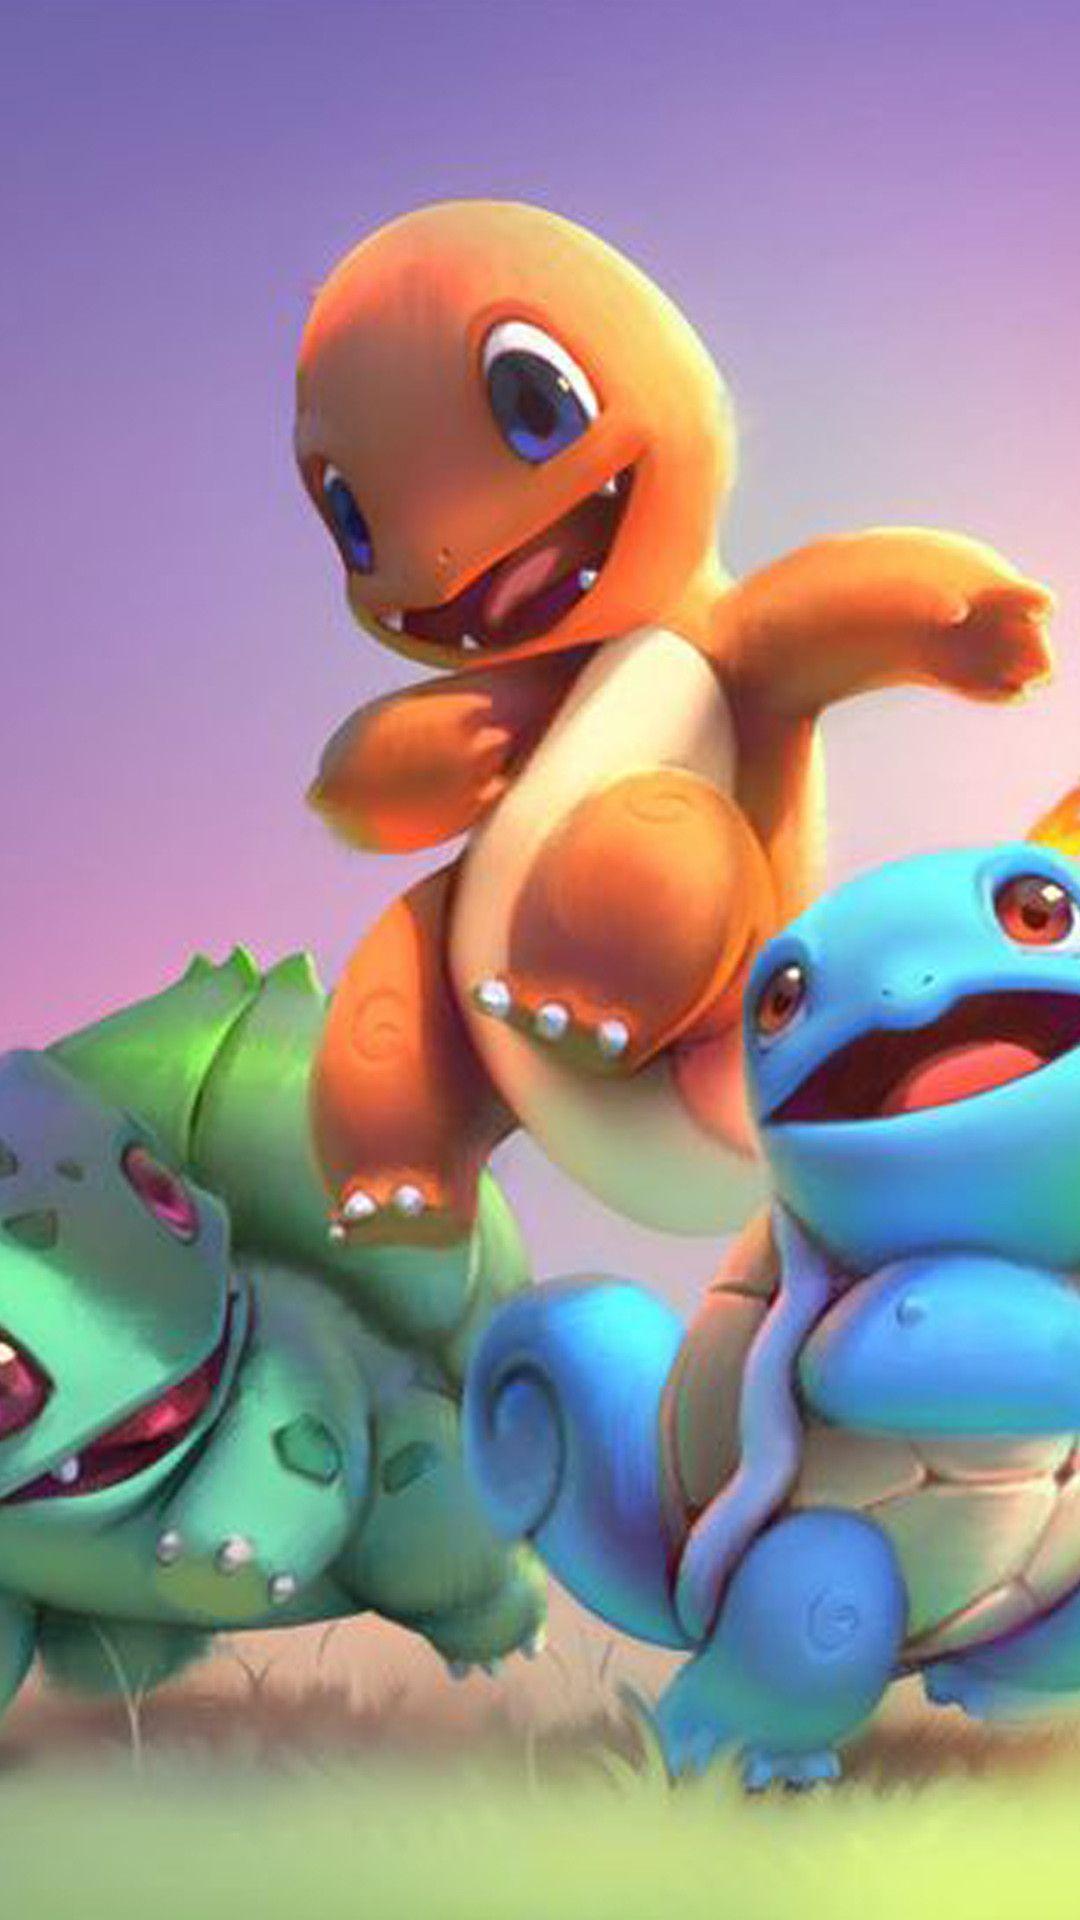 Pokemon Cool Samsung Galaxy s7 wallpaper